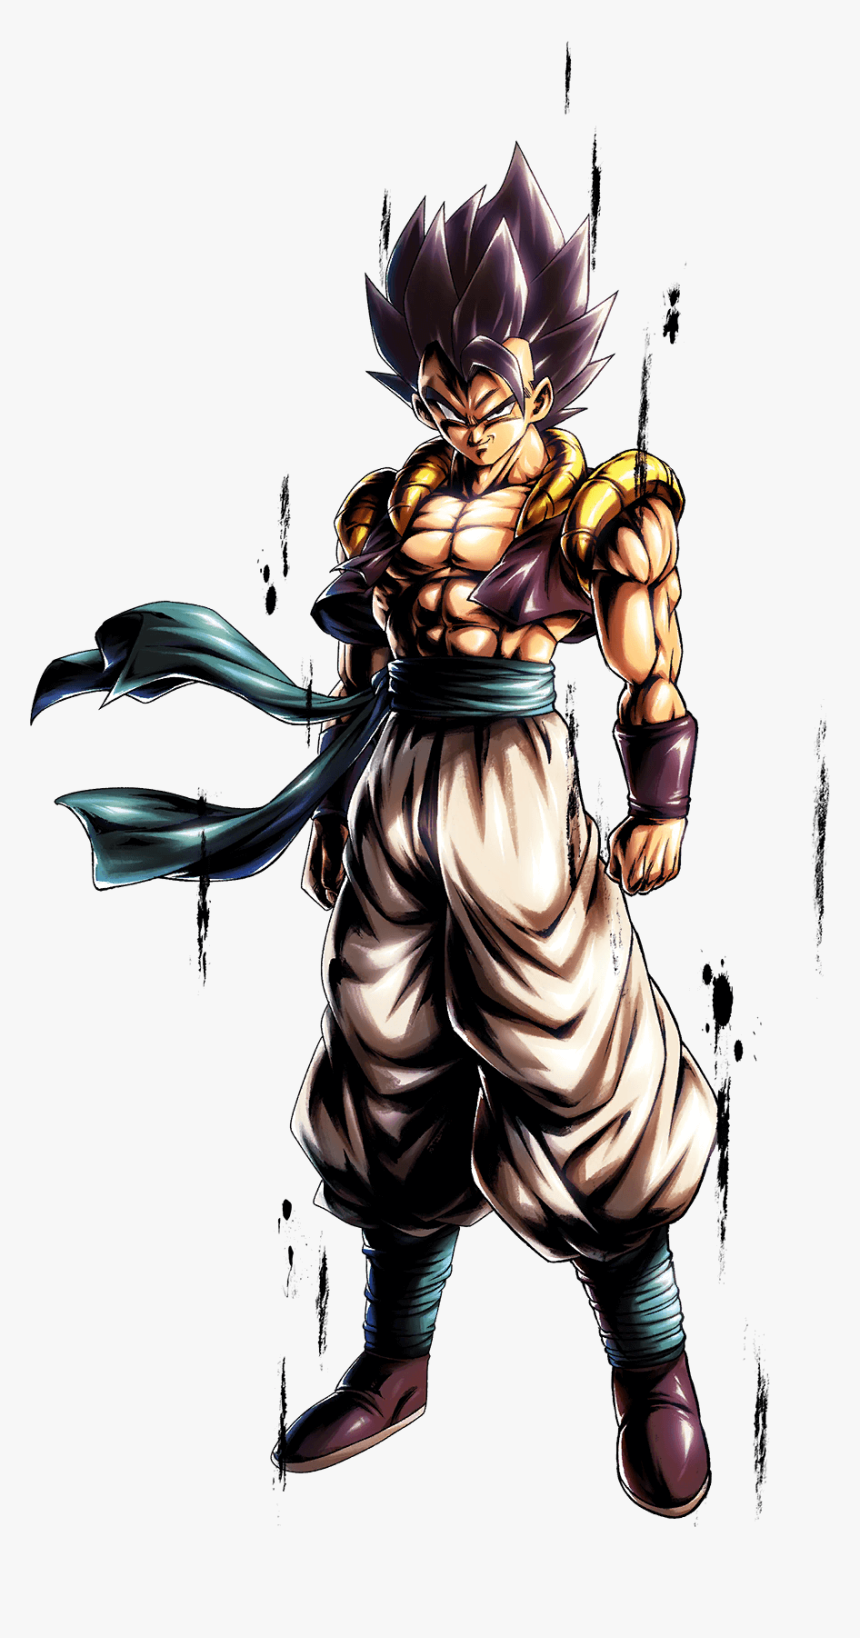 Hd Super Saiyan - Dragon Ball Legends Gogeta, HD Png Download, Free Download